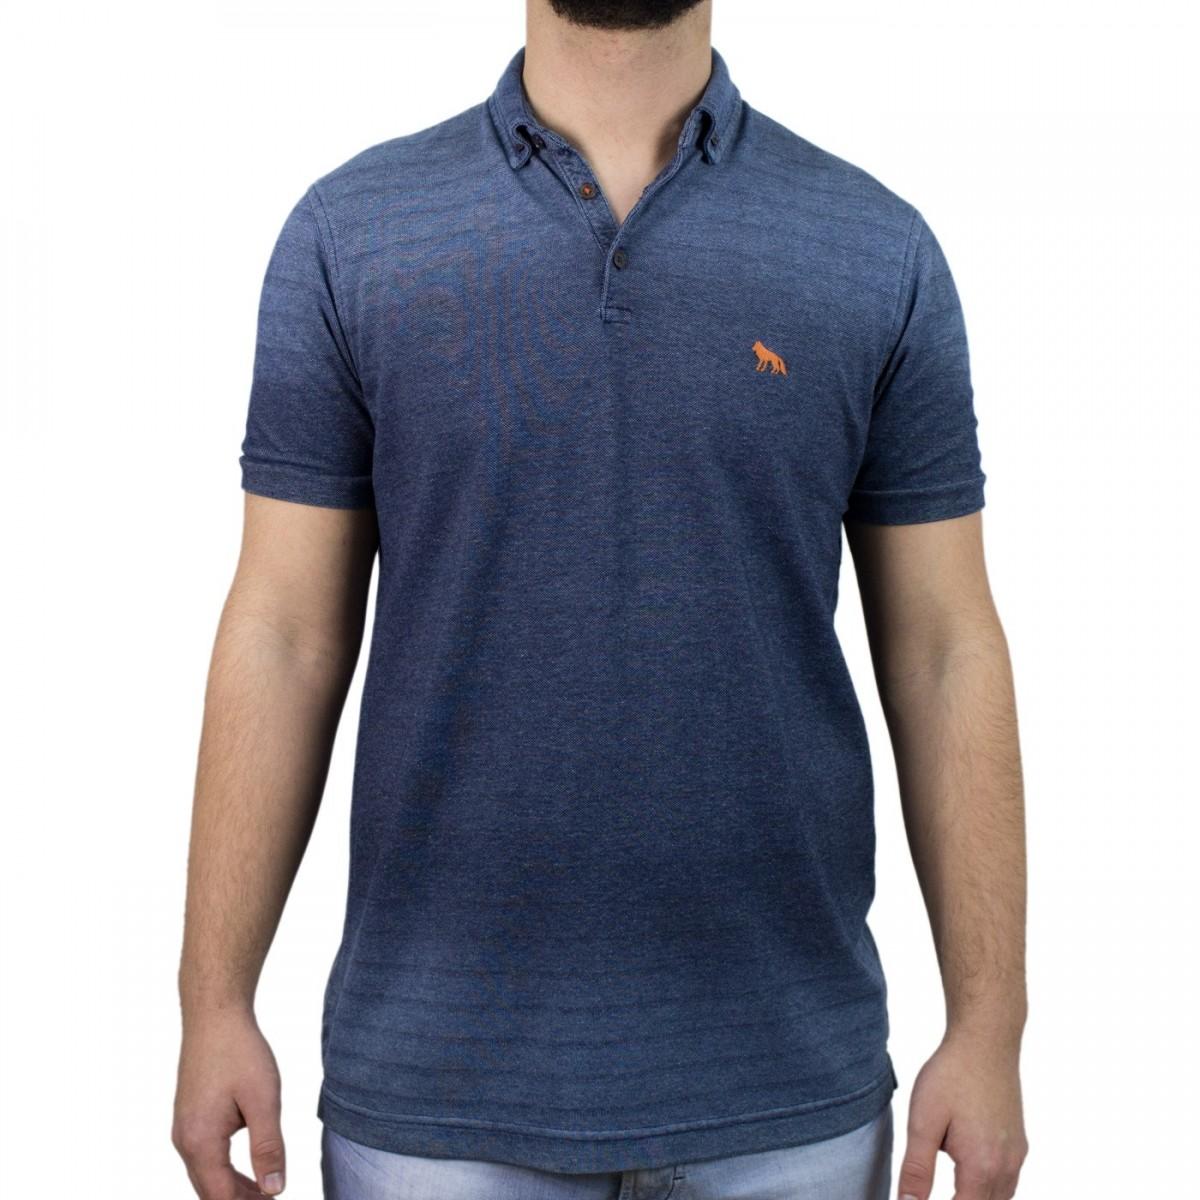 897721b4e Bizz Store - Camisa Polo Masculina Acostamento Manga Curta Marinho